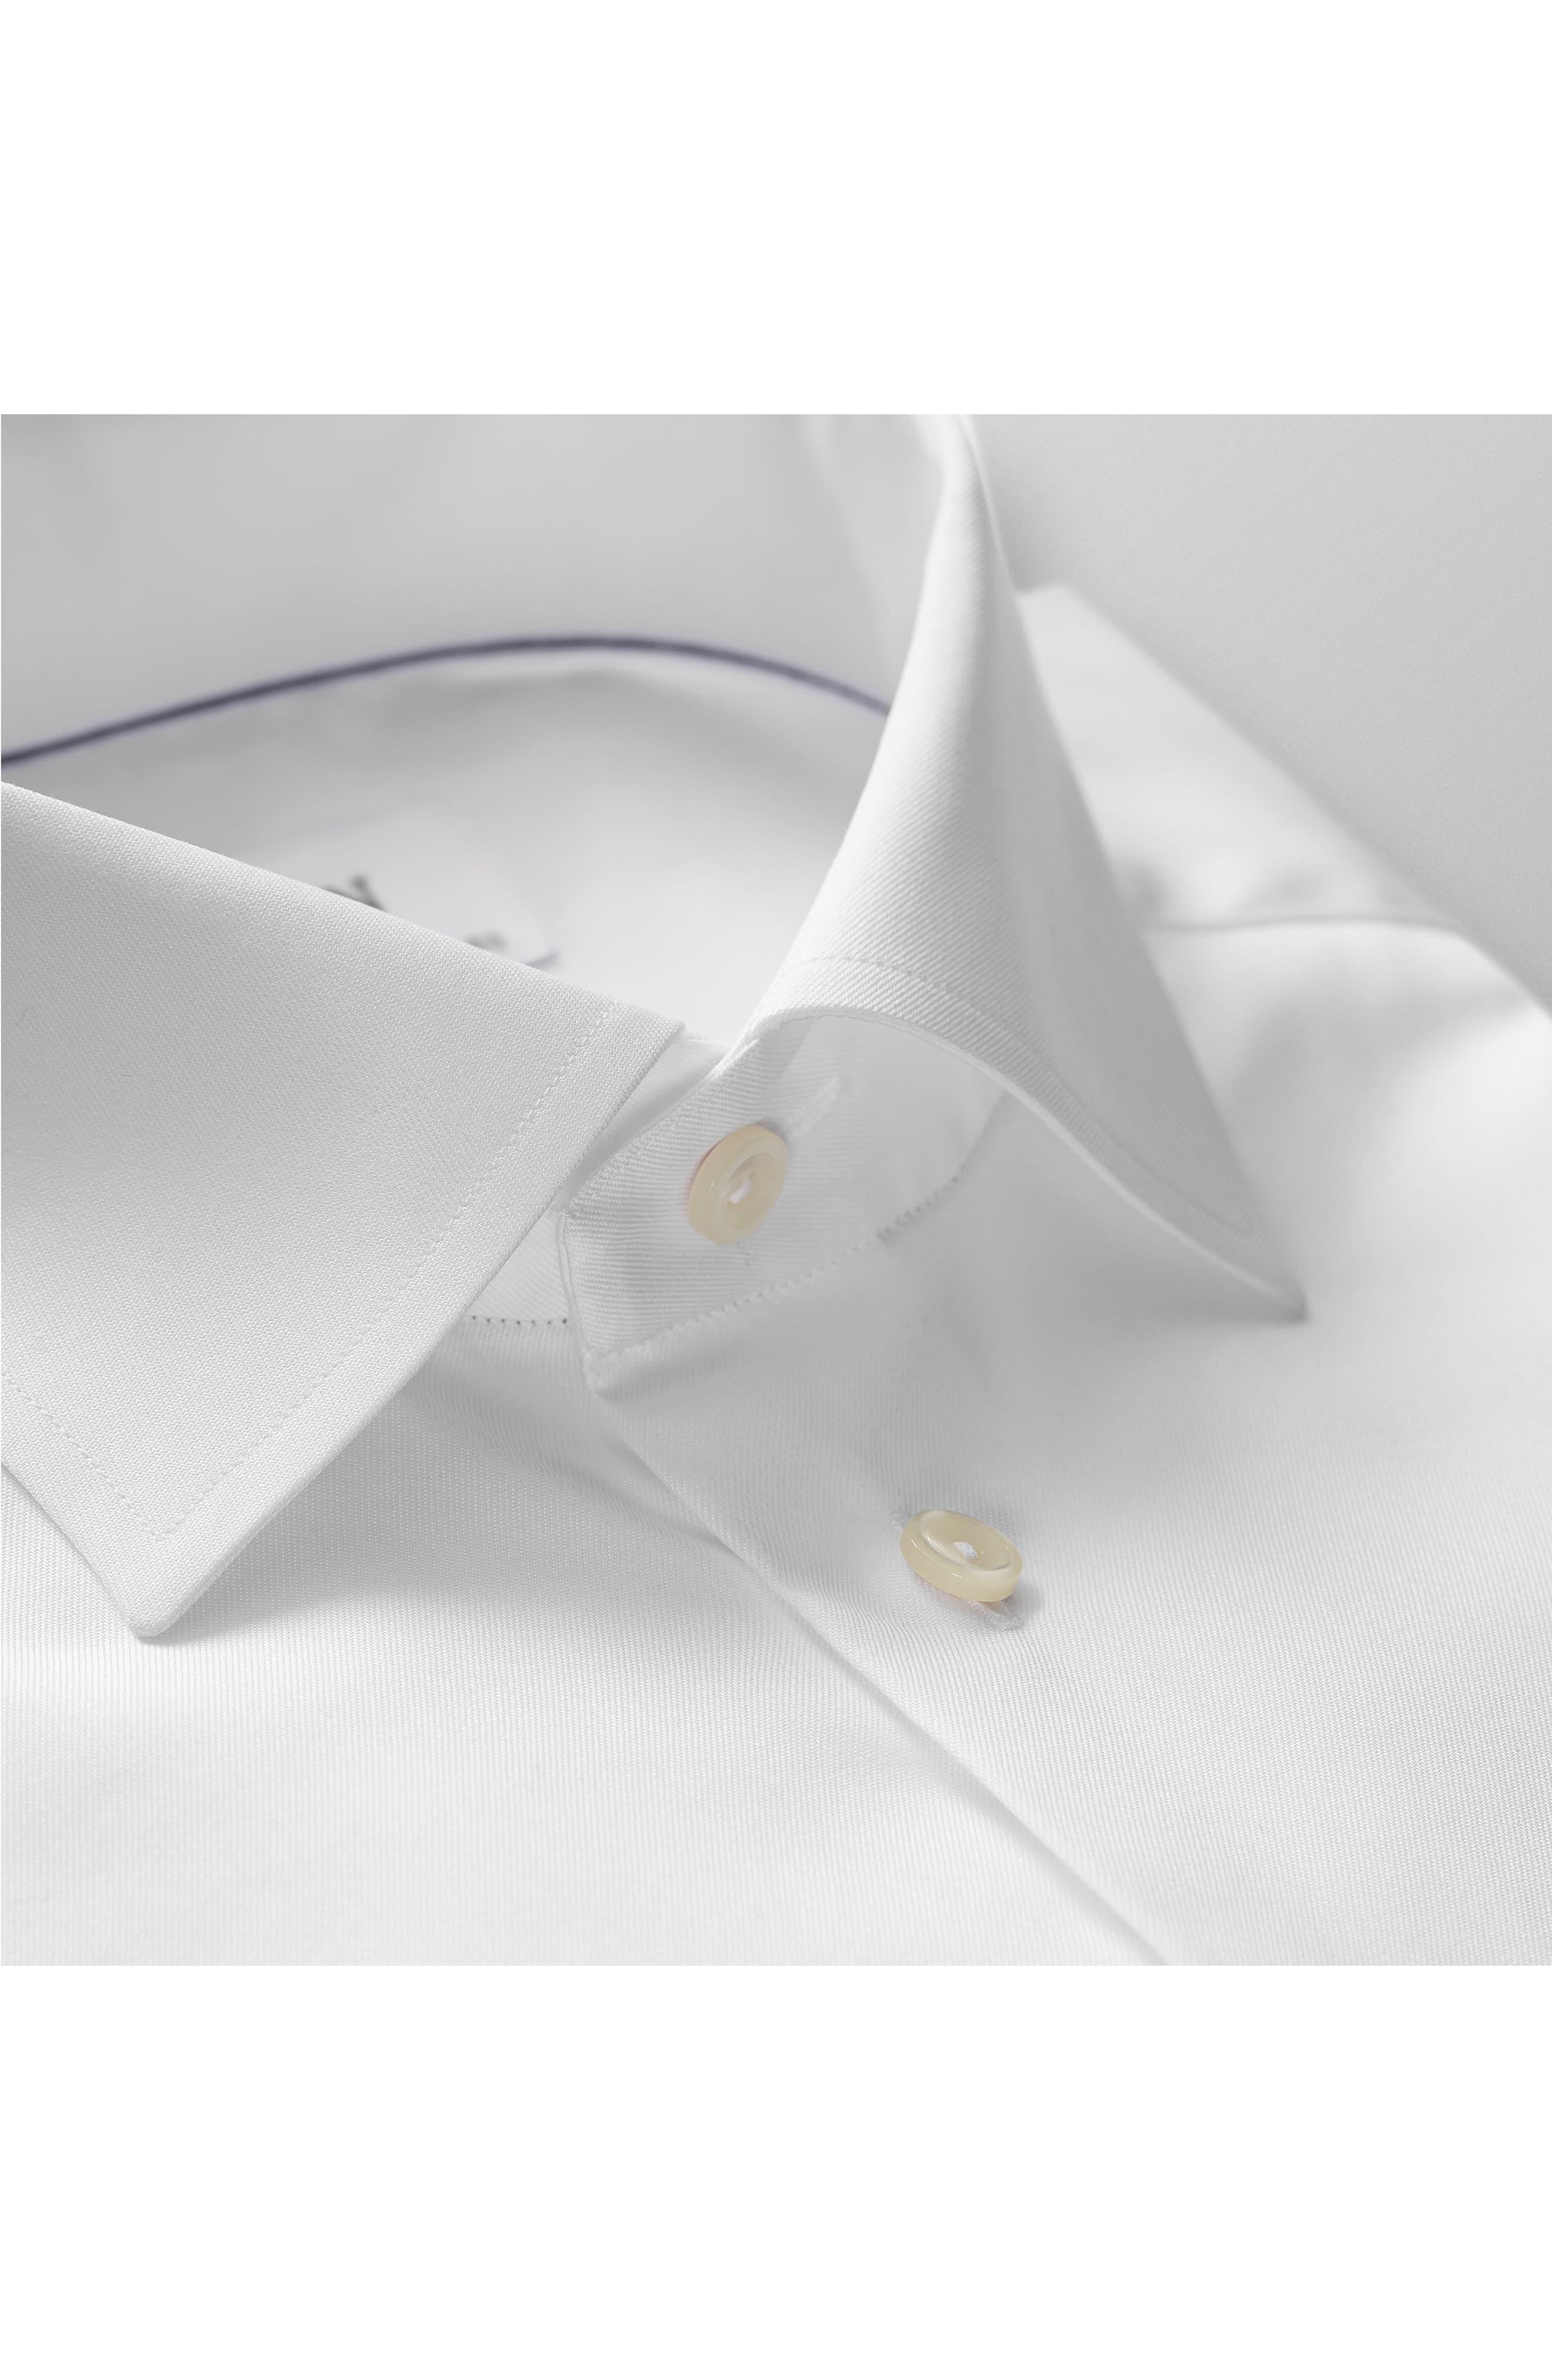 Slim Fit Twill Dress Shirt,                             Alternate thumbnail 6, color,                             WHITE